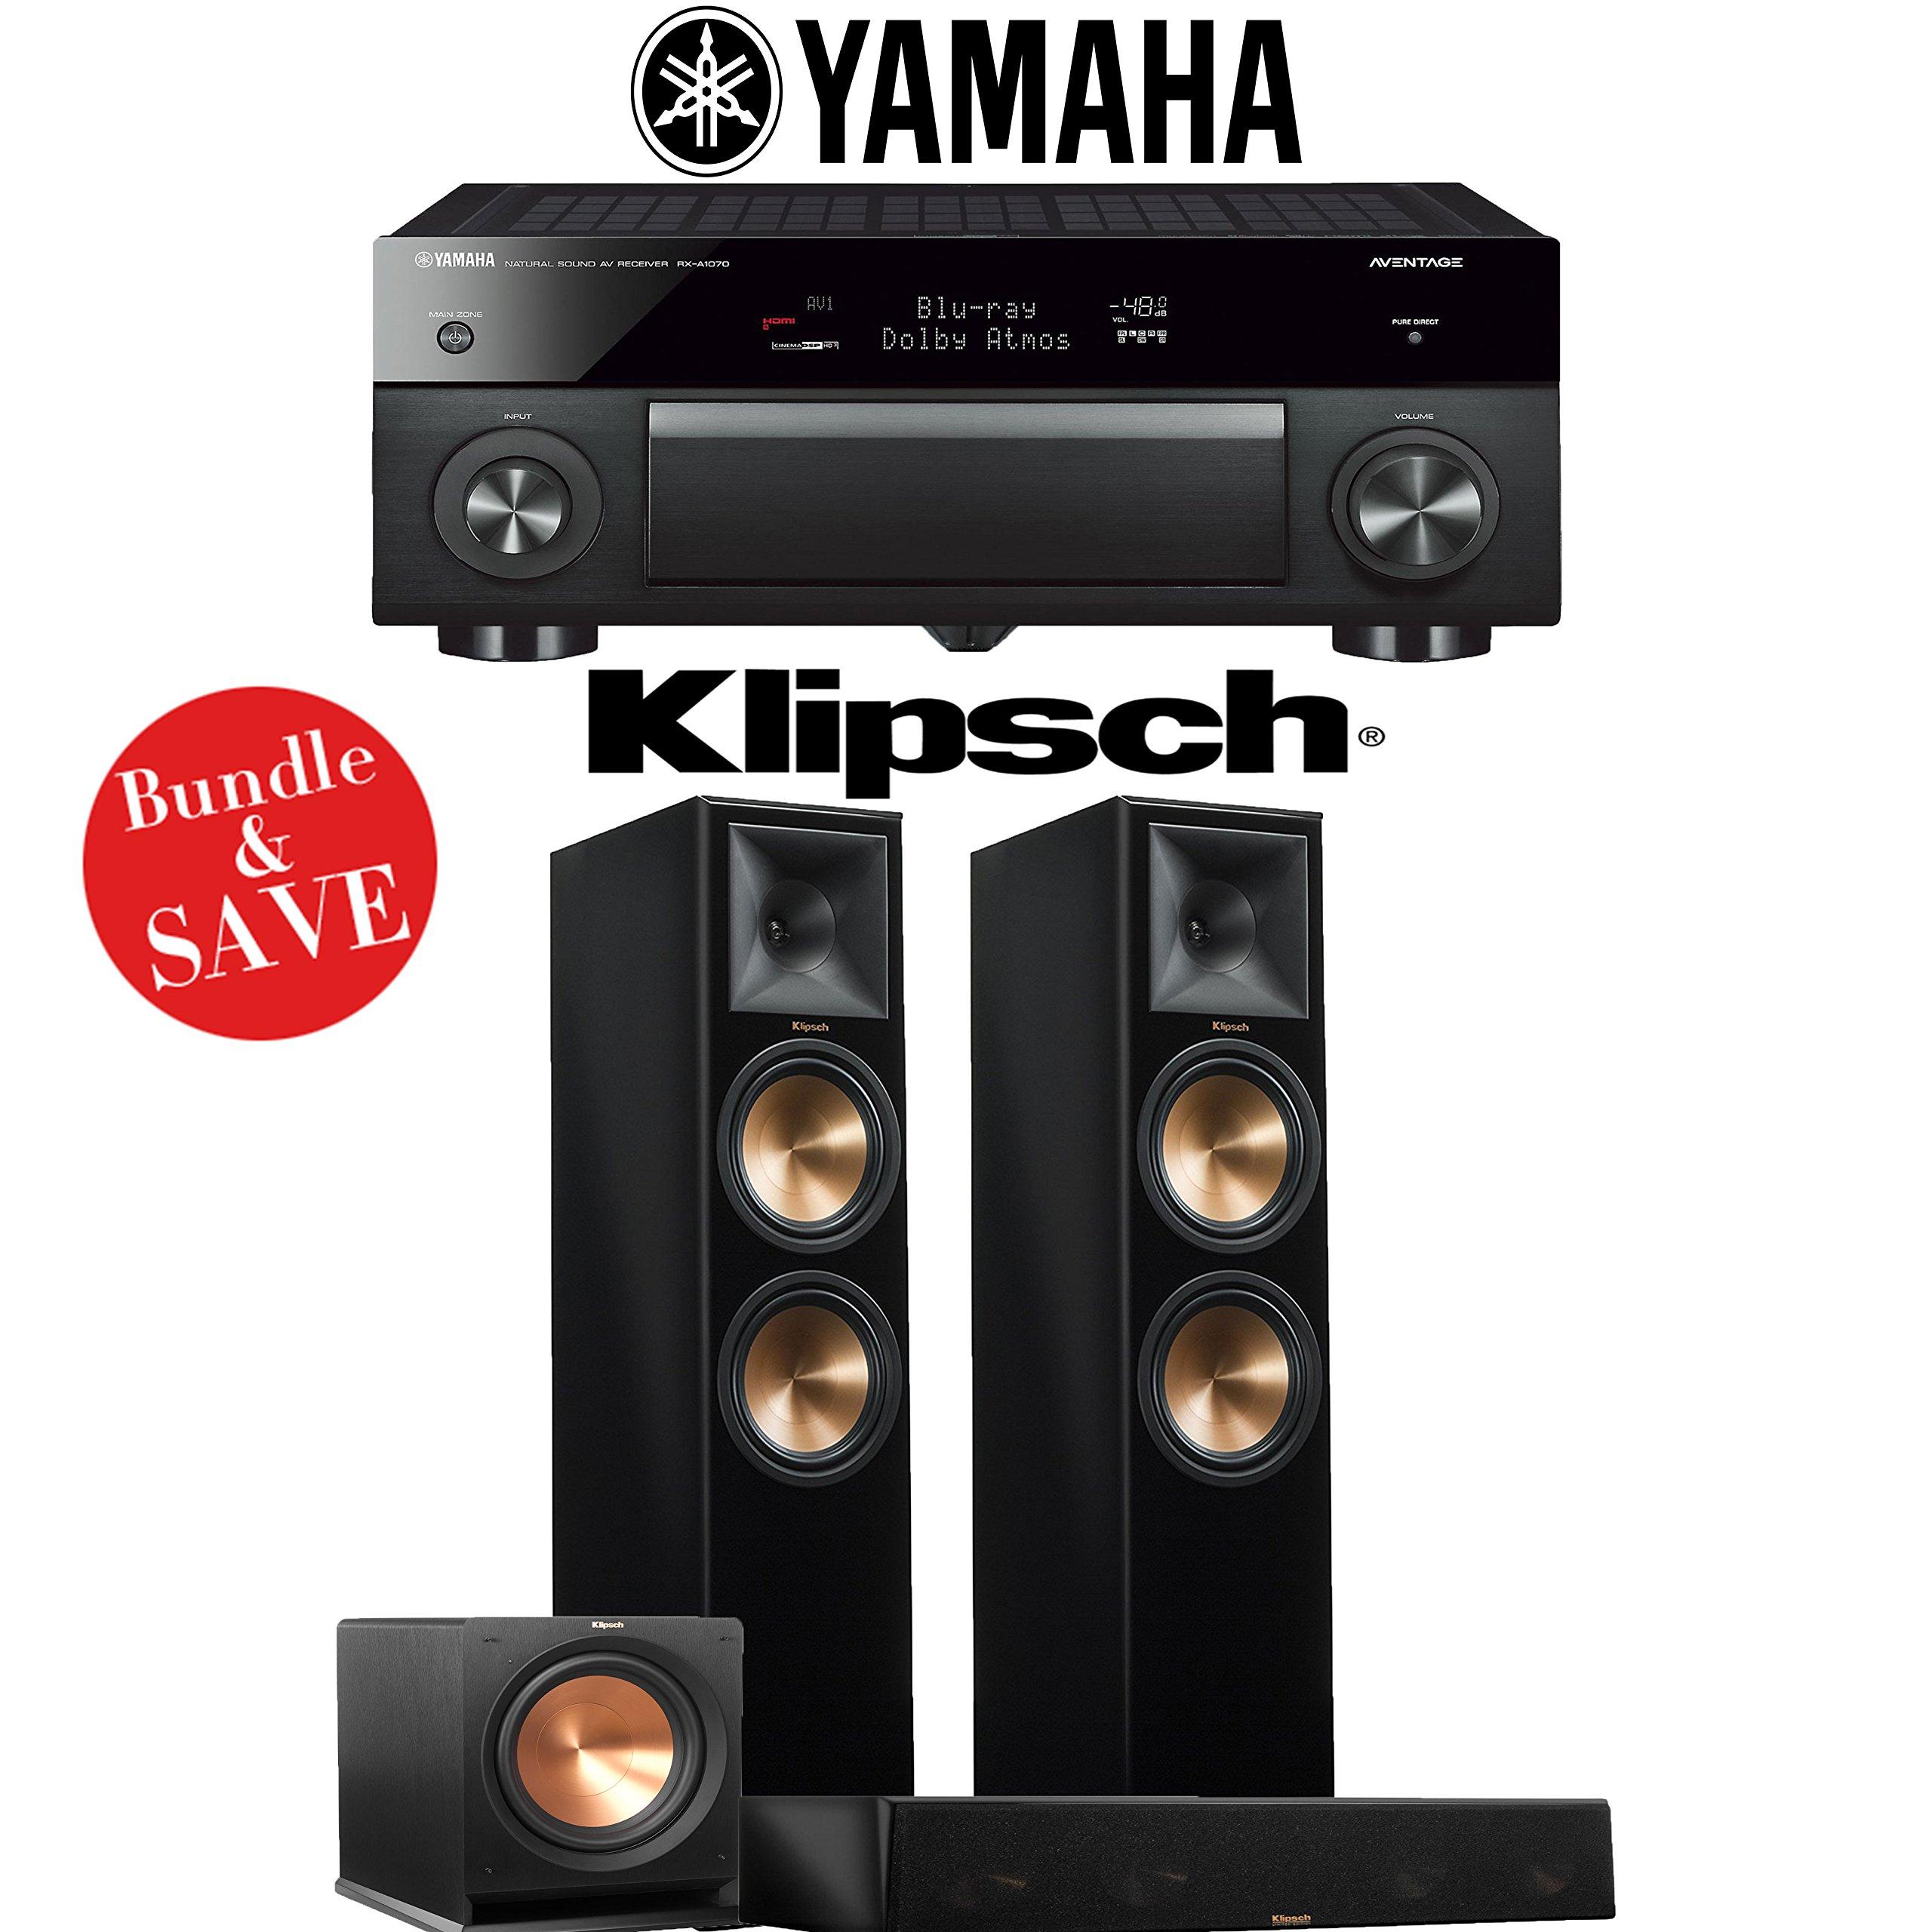 Yamaha AVENTAGE RX-A1070BL 7.2-Ch 4K Network AV Receiver + Klipsch RP-280F + Klipsch RP-450C + Klipsch R-112SW - 3.1-Ch Home Theater Package (Piano Black) by Klipschhh